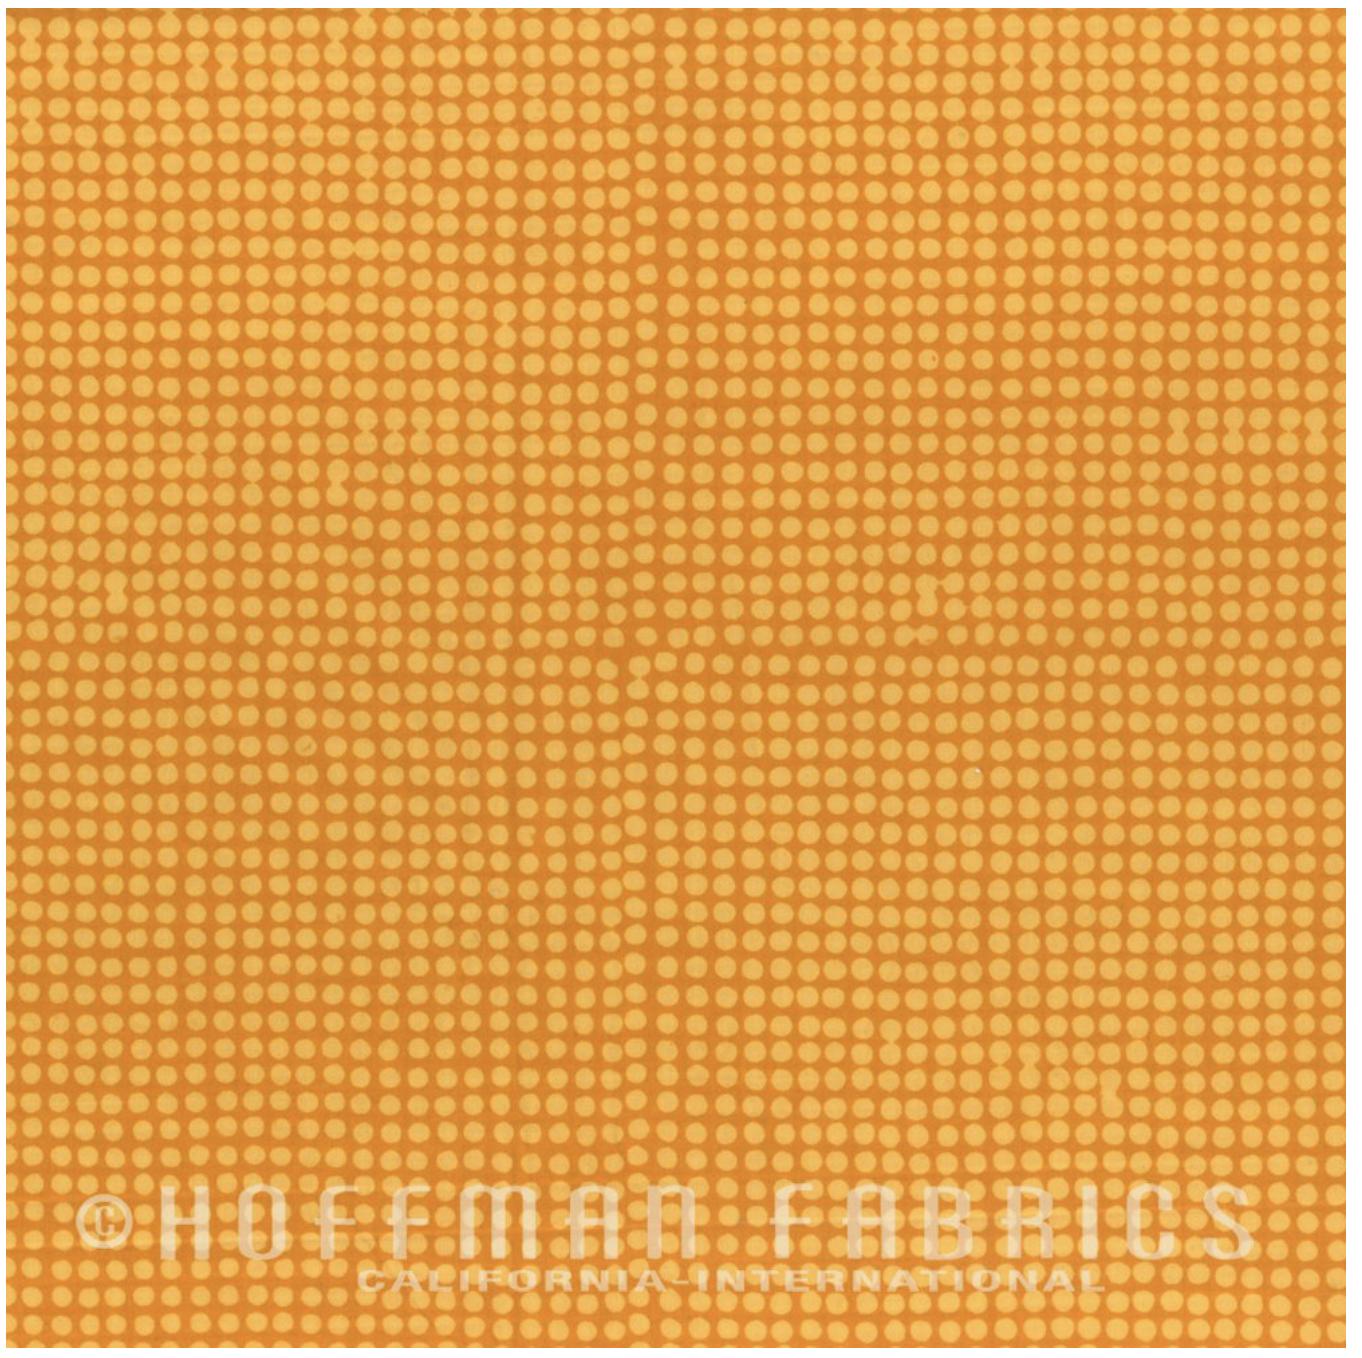 Raindrops Sunflower - Hand Dyed Batiks - Me + You Hoffman Fabrics 101-150